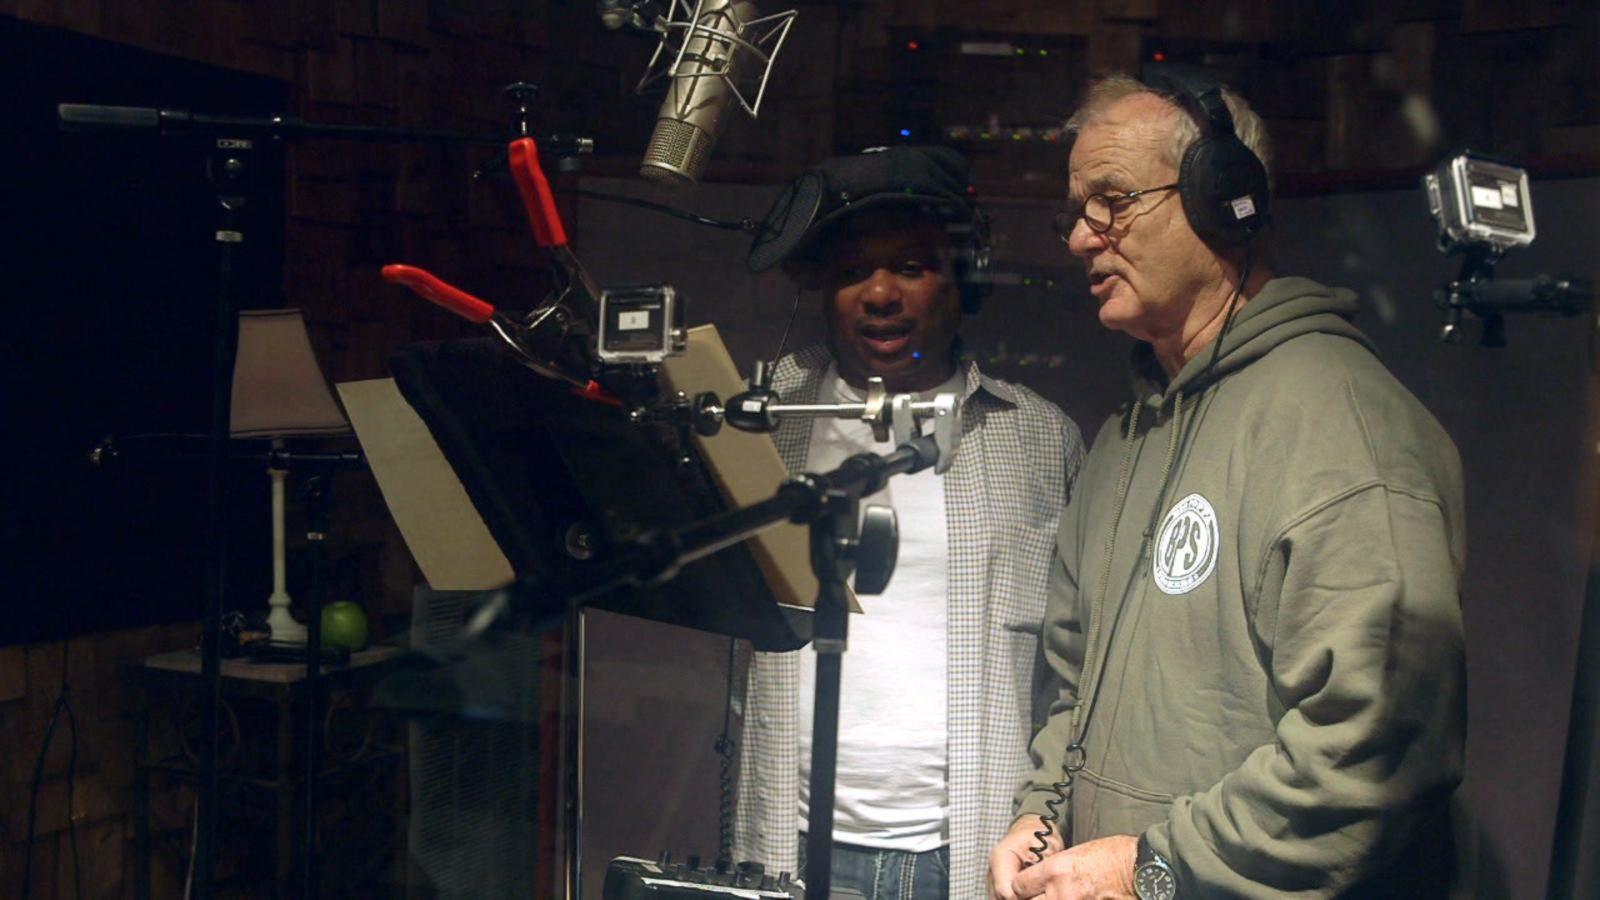 VIDEO: Bill Murray Sings as Baloo in 'The Jungle Book' Recording Studio